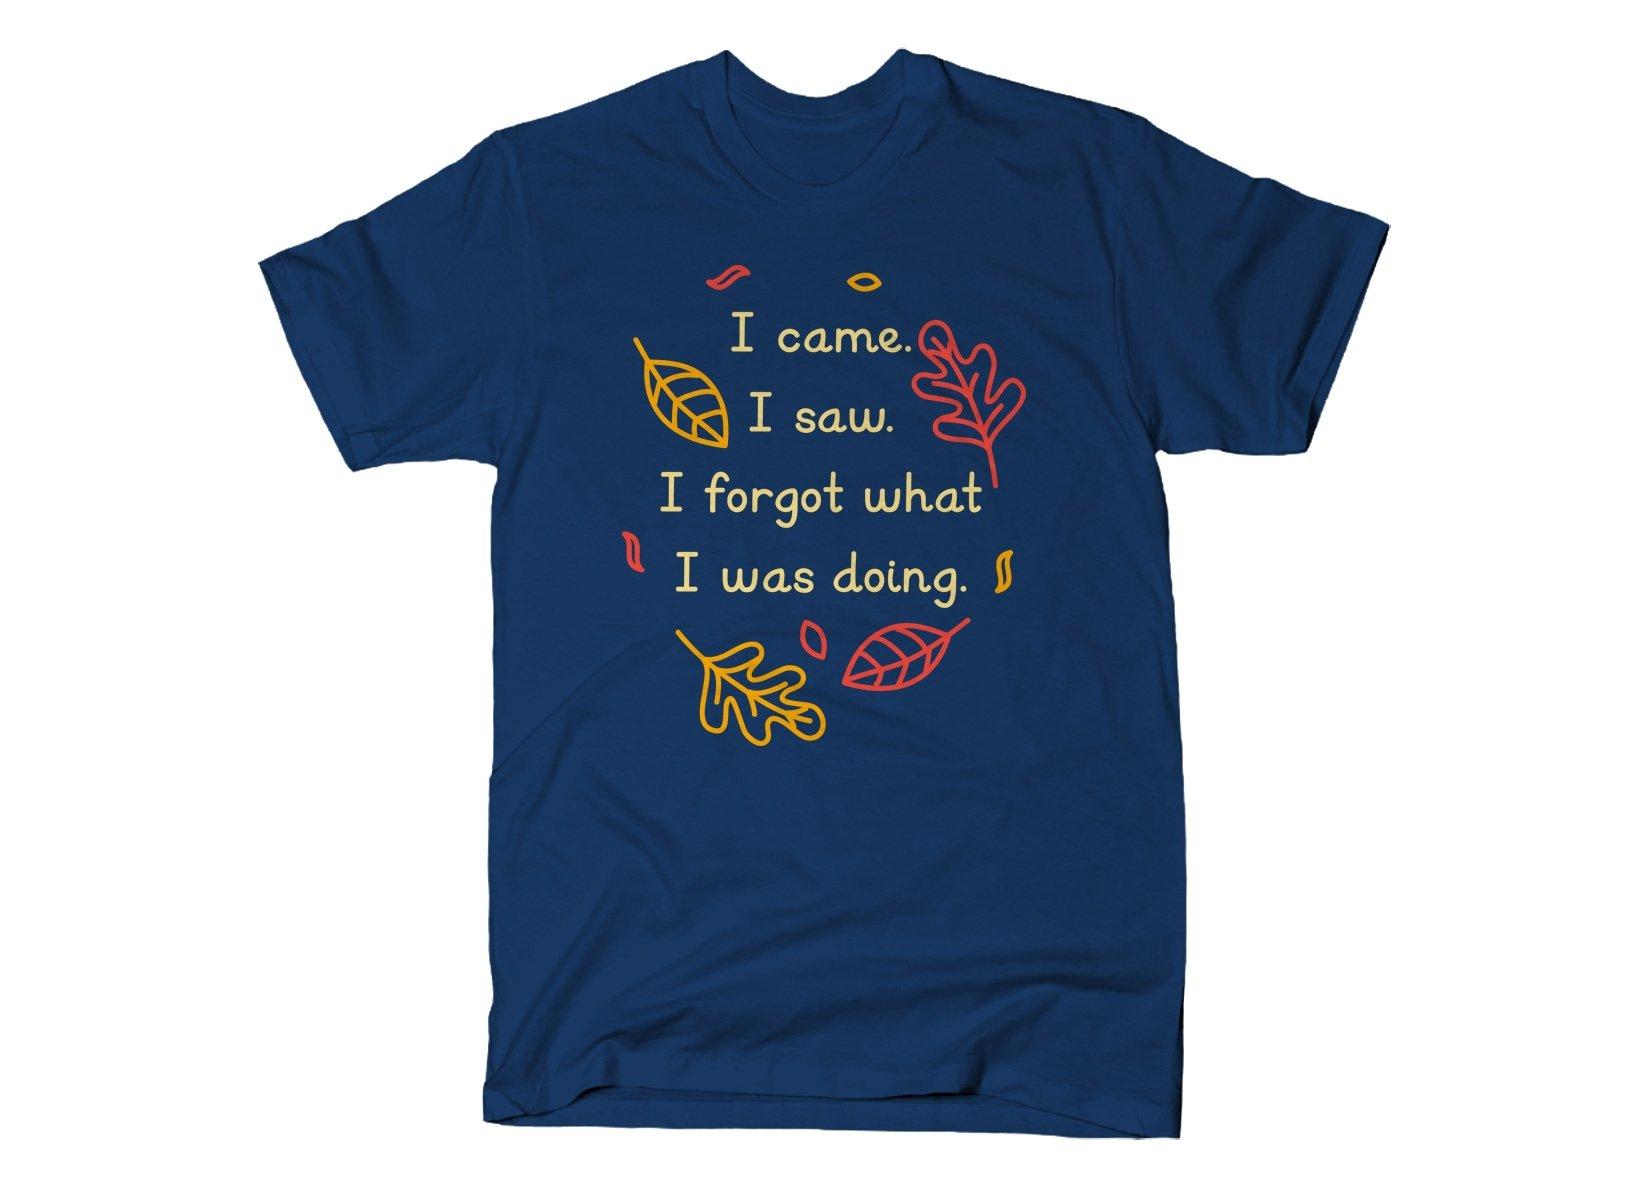 I Came. I Saw. I Forgot What I Was Doing. on Mens T-Shirt